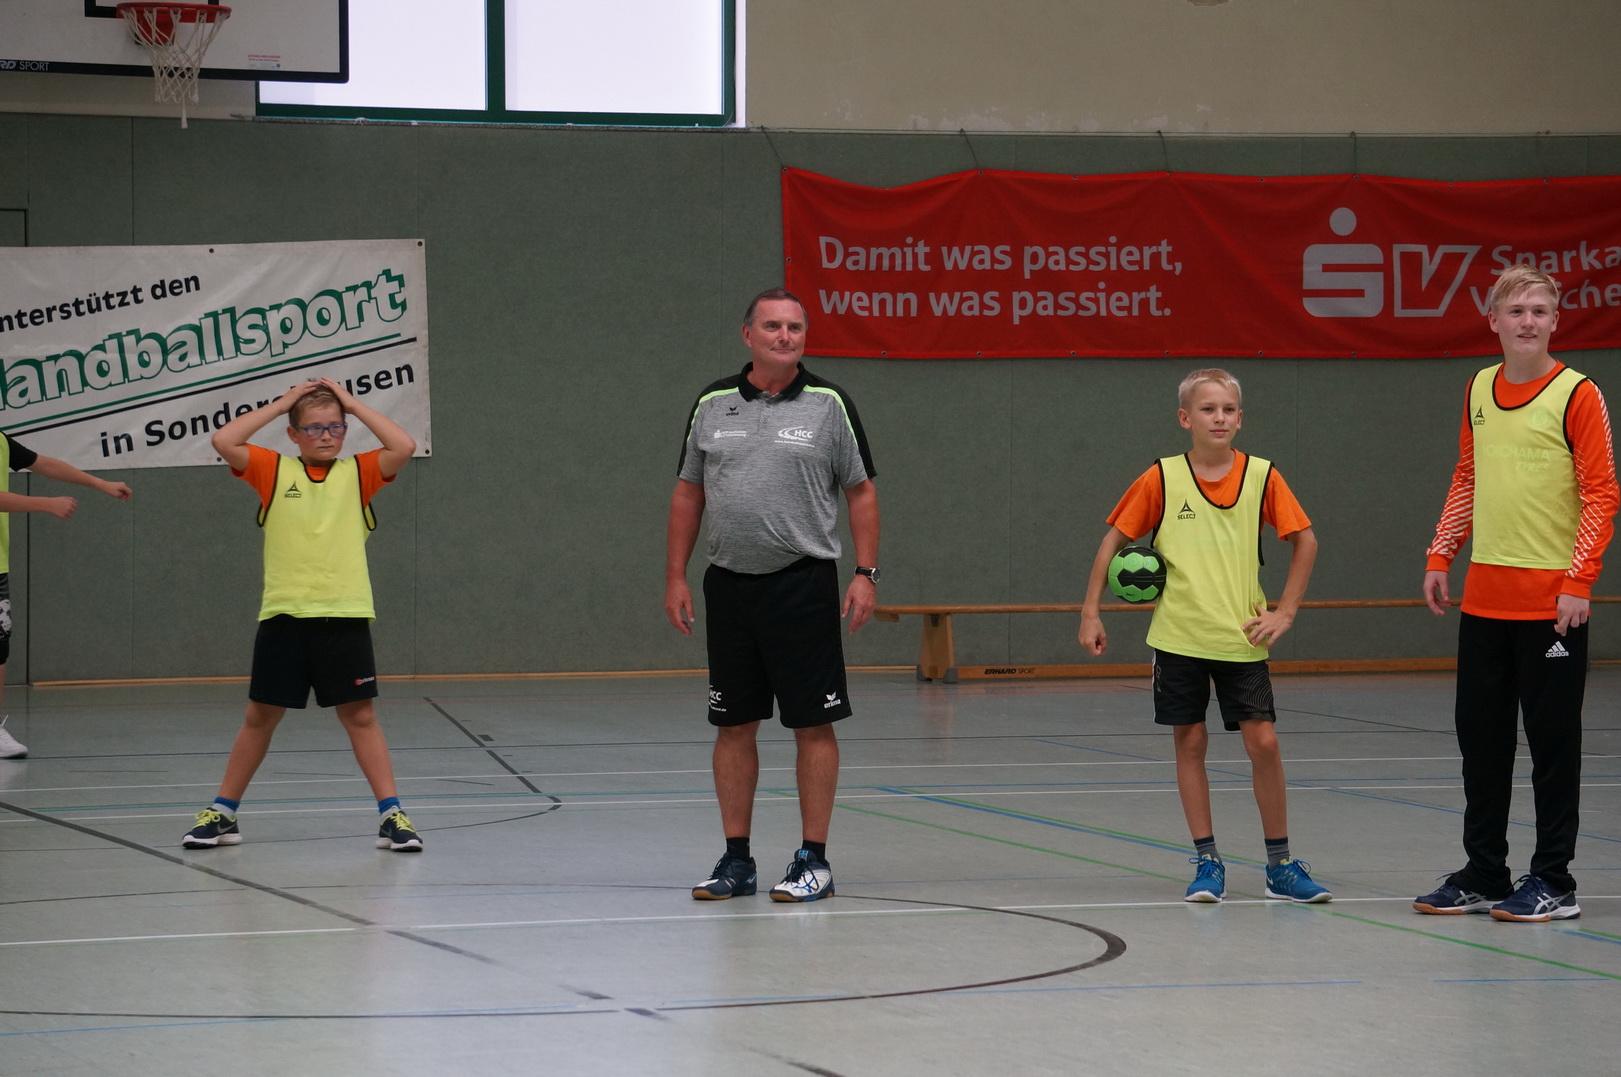 201808_Handballcamp_SDH_MG_115w